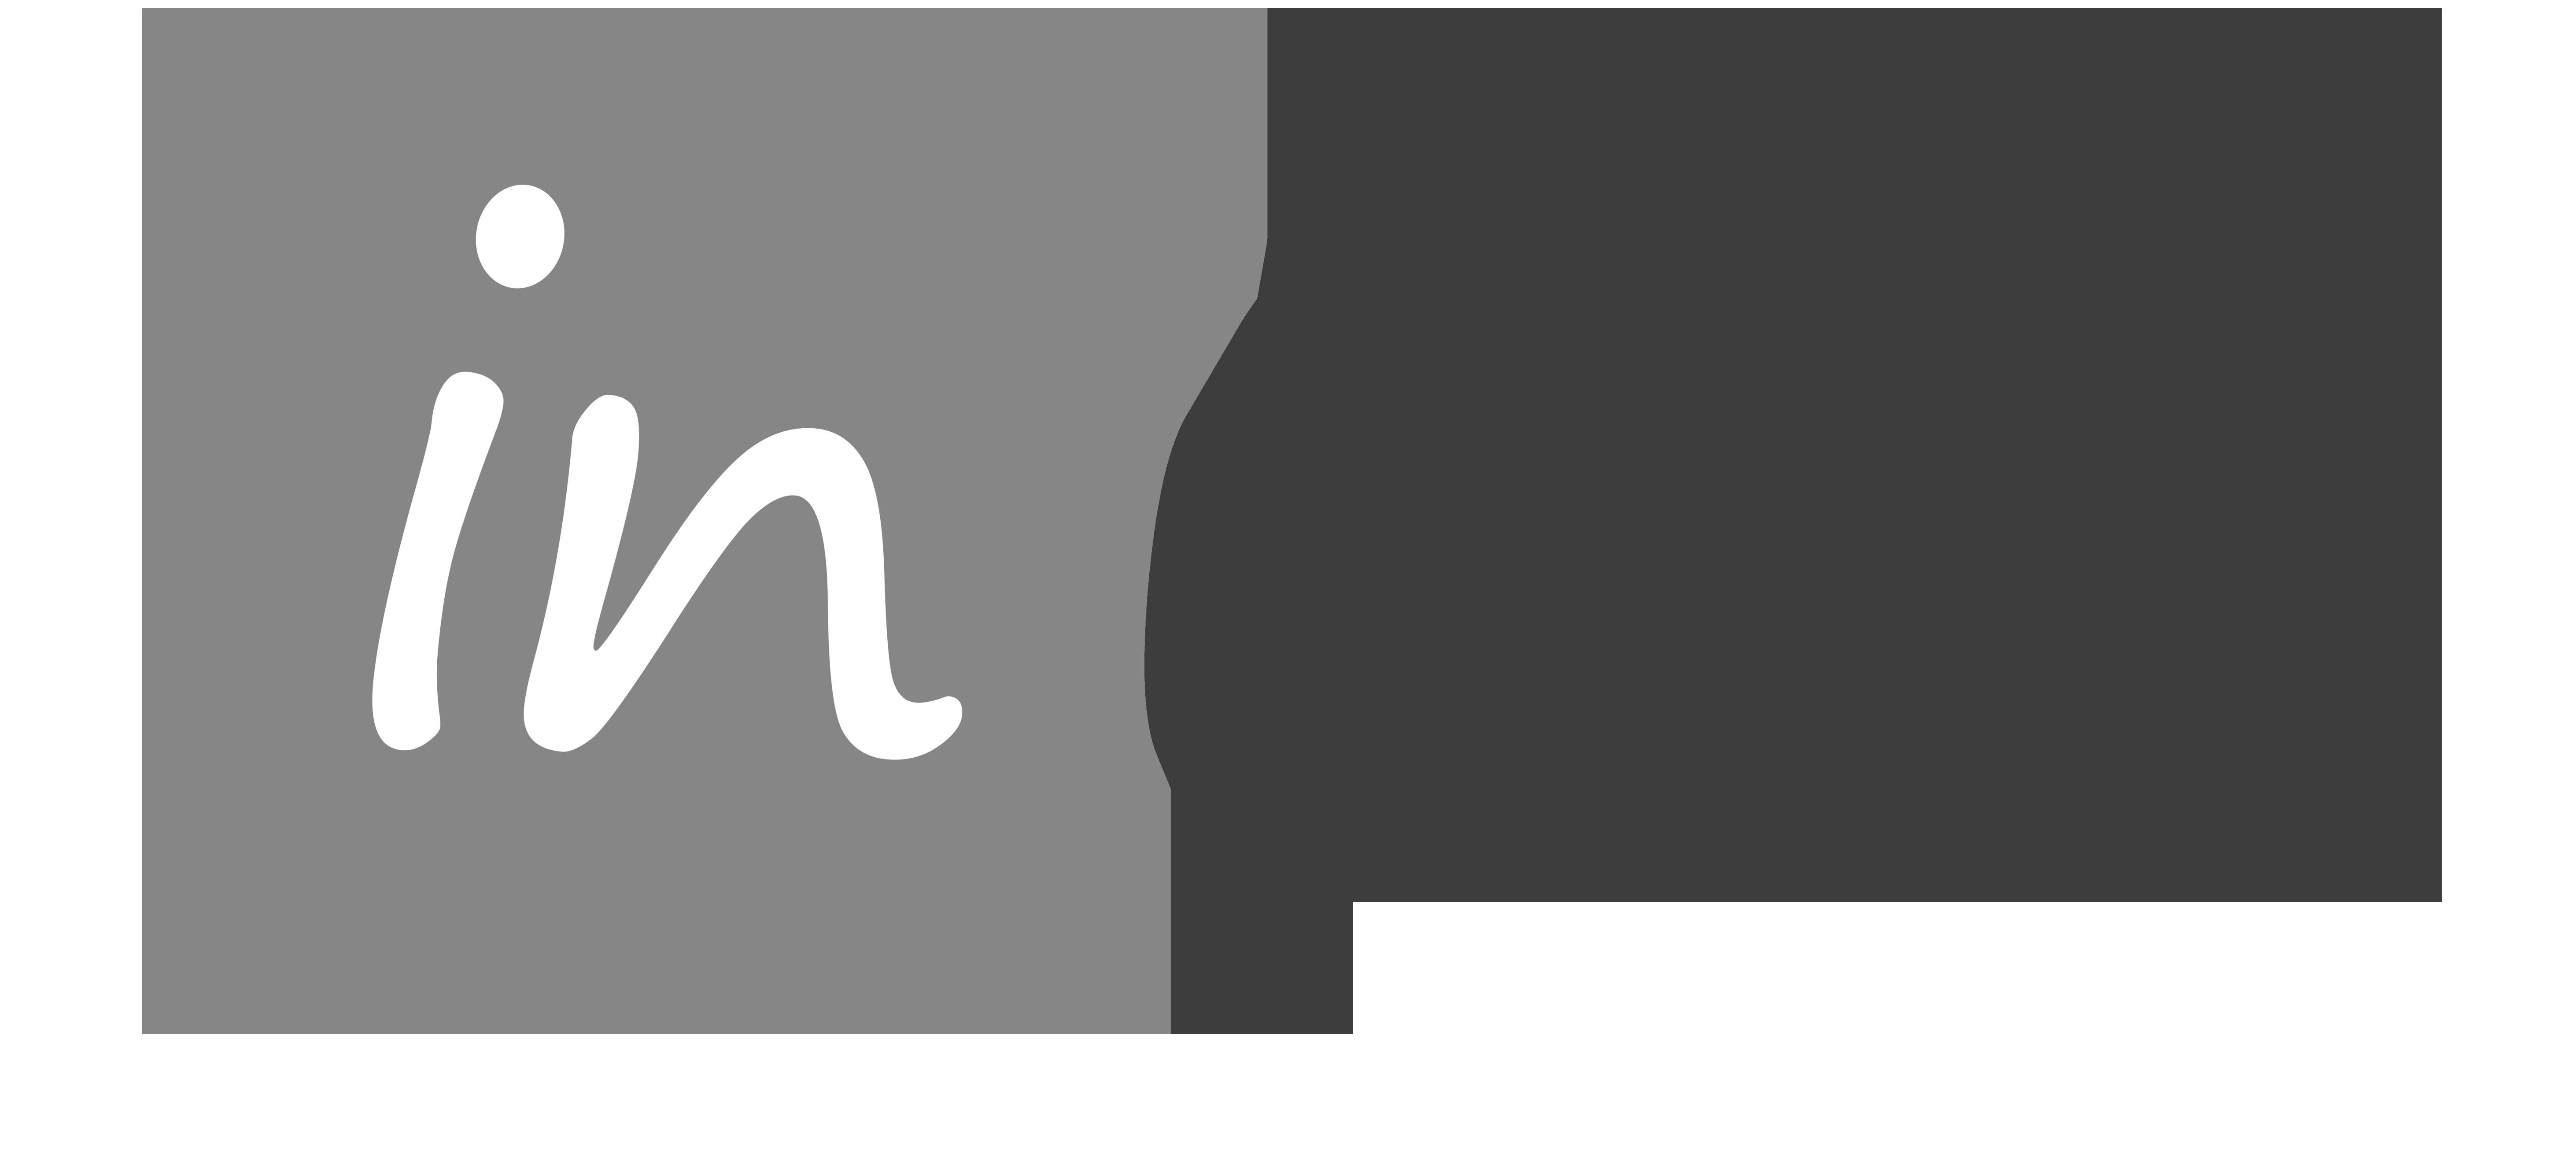 Incash logo